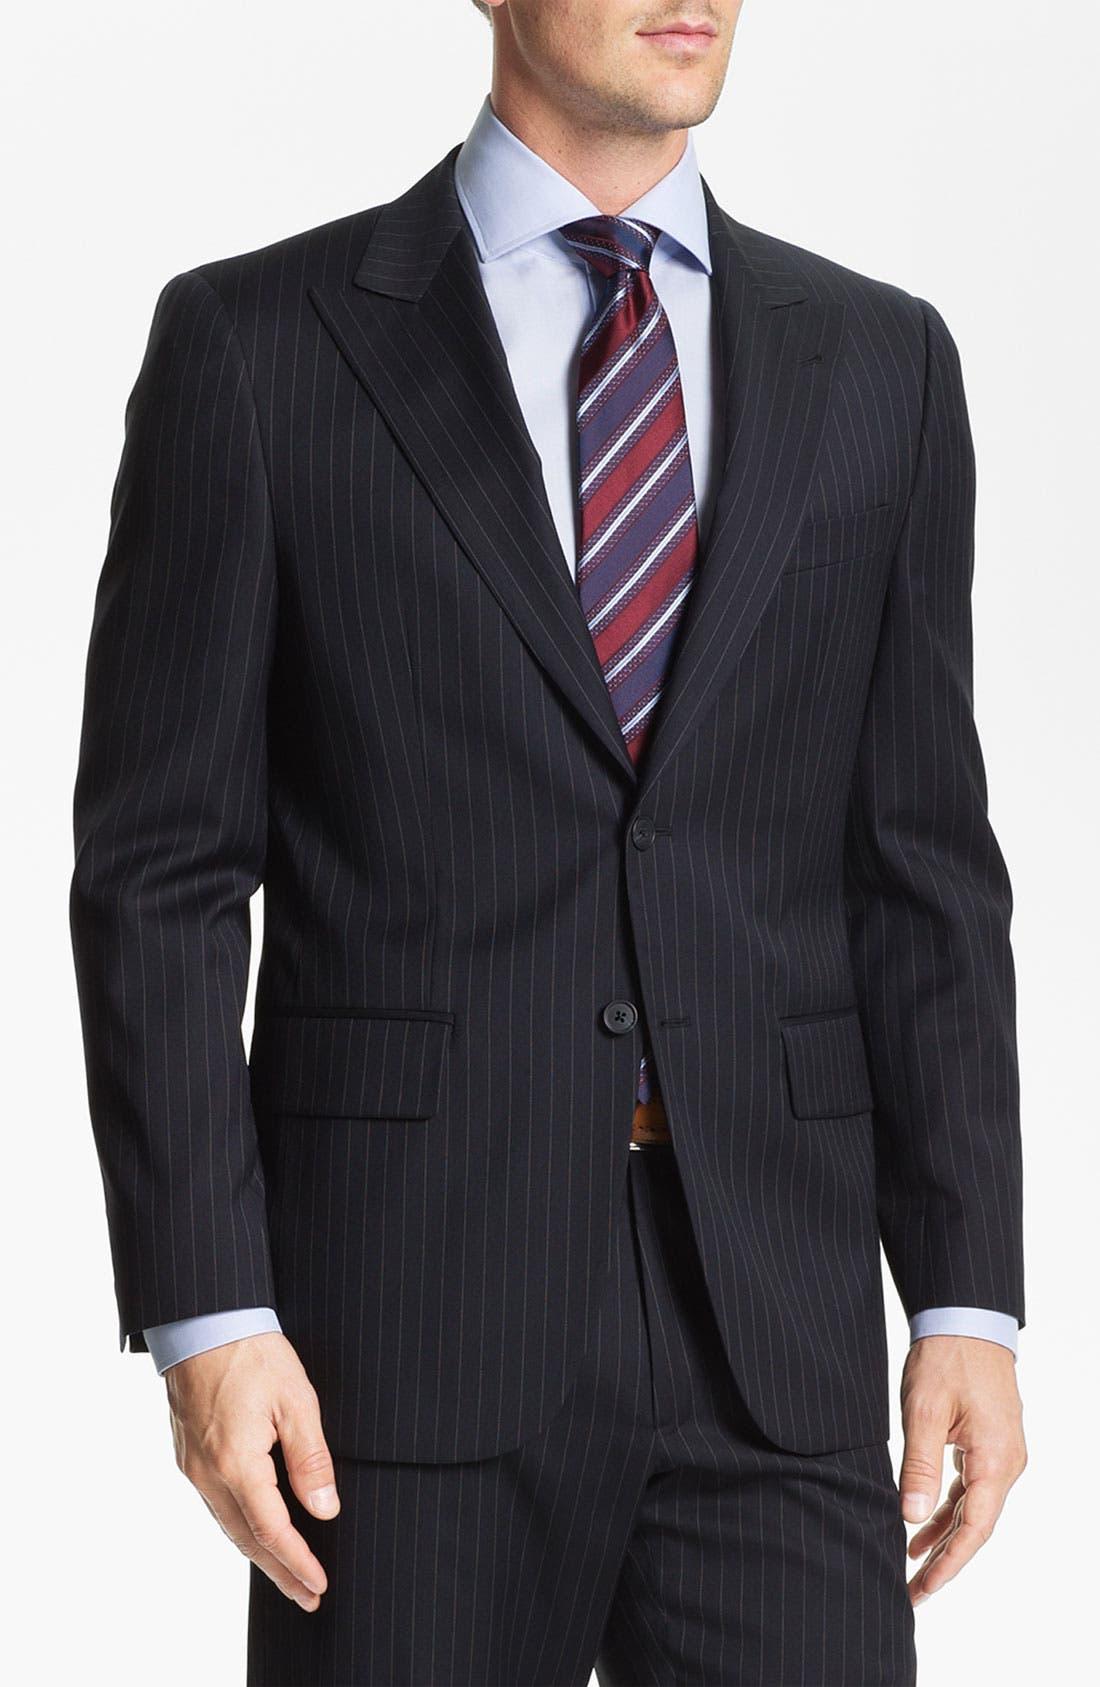 Main Image - Joseph Abboud Trim Fit Peak Lapel Stripe Suit